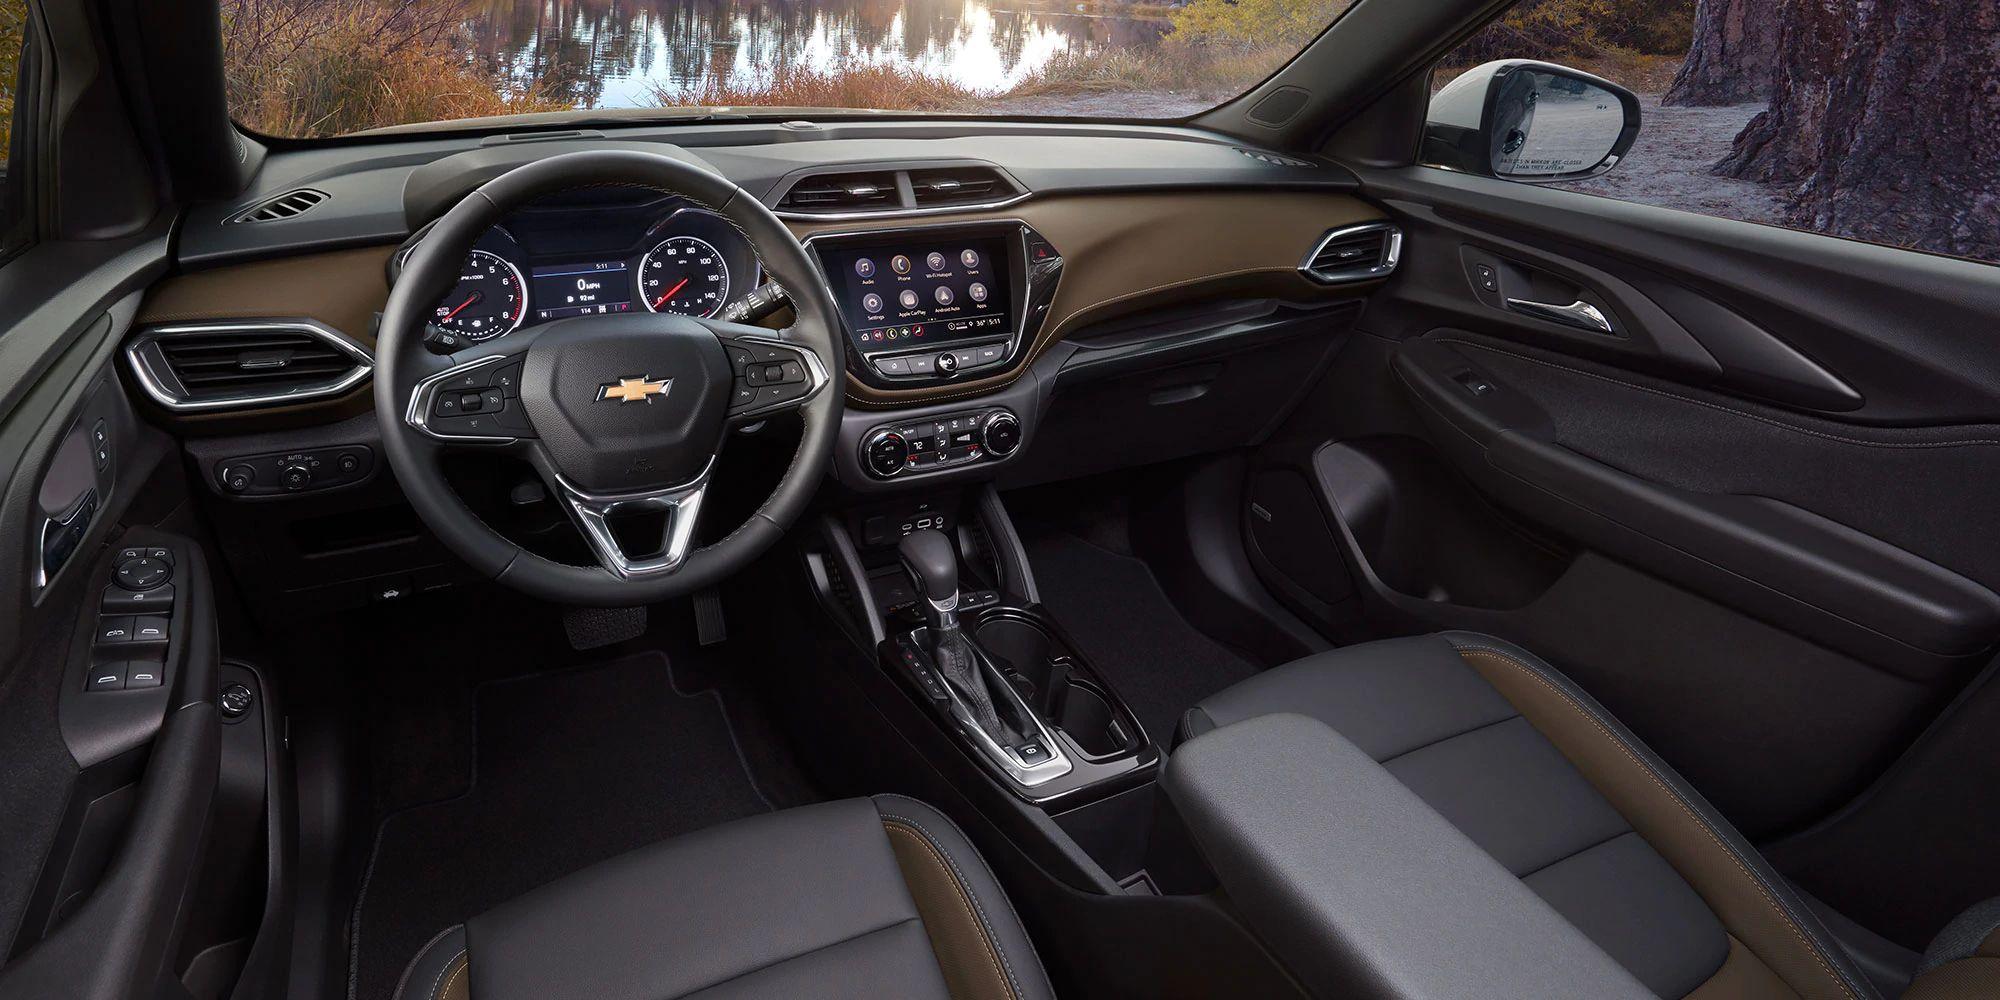 New 2021 Chevrolet Trailblazer for sale in Louisiana, AK